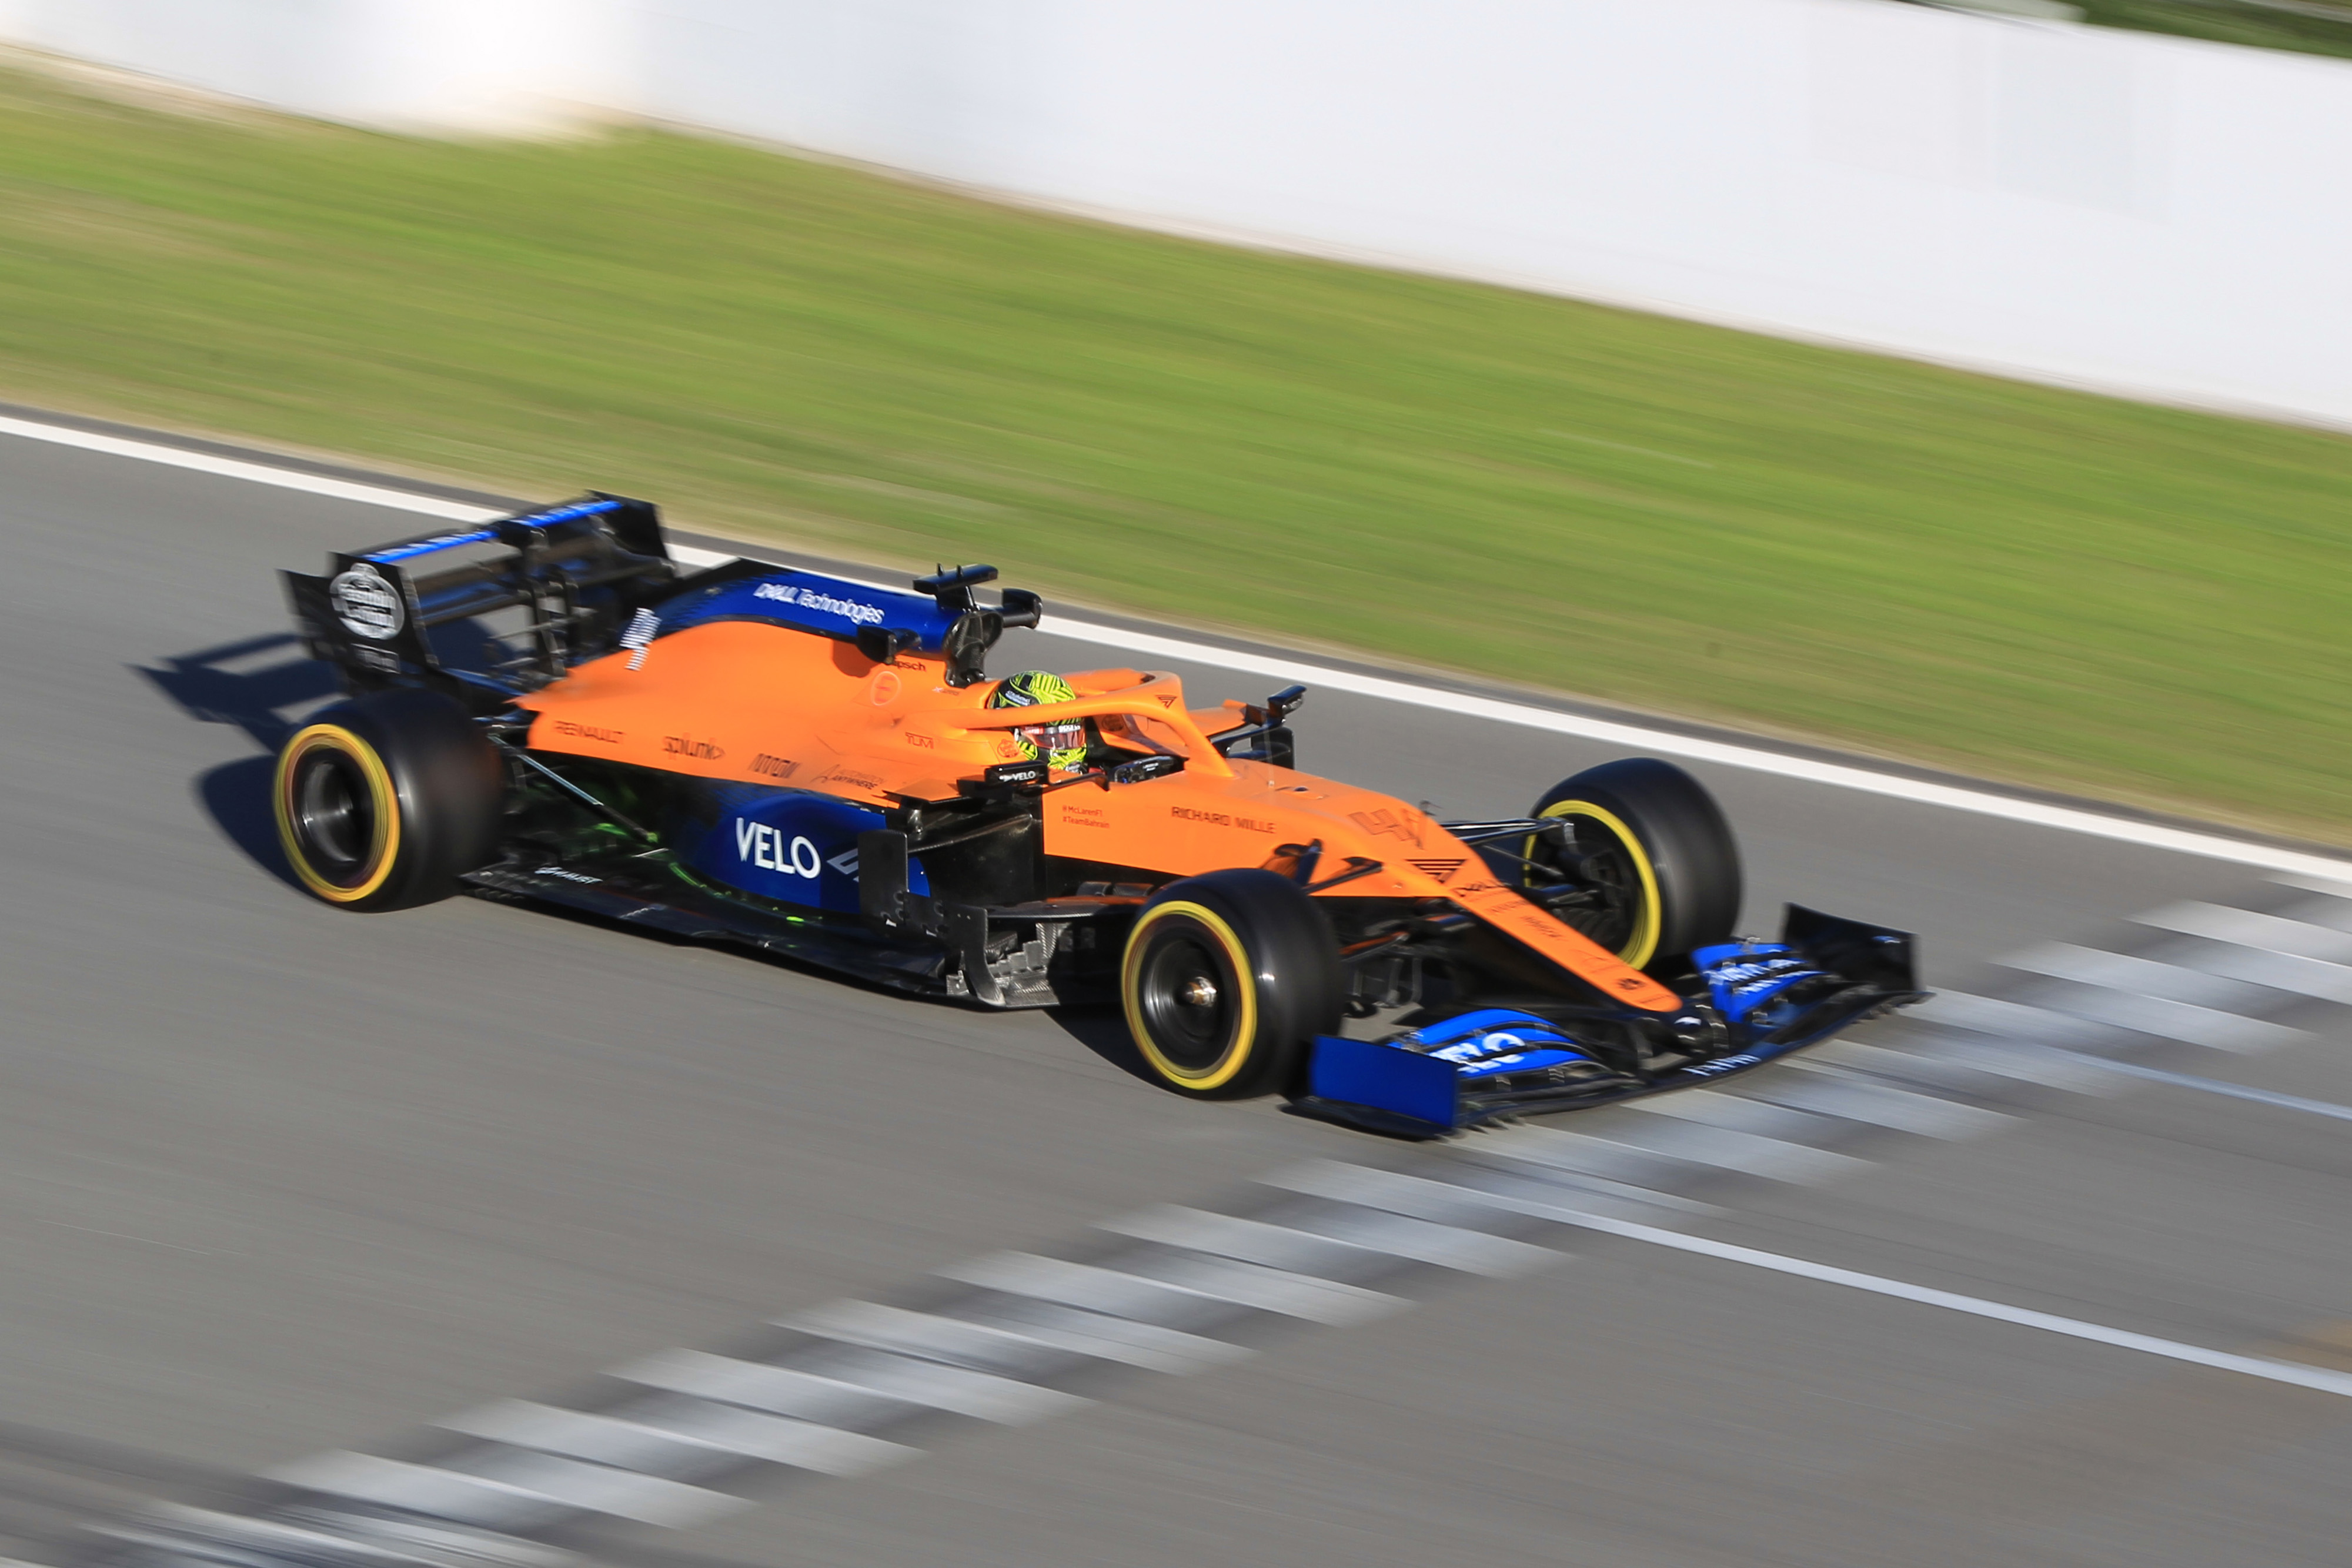 F1 Formula 1 Lando Norris McLaren MCL35 testing car nicer to drive